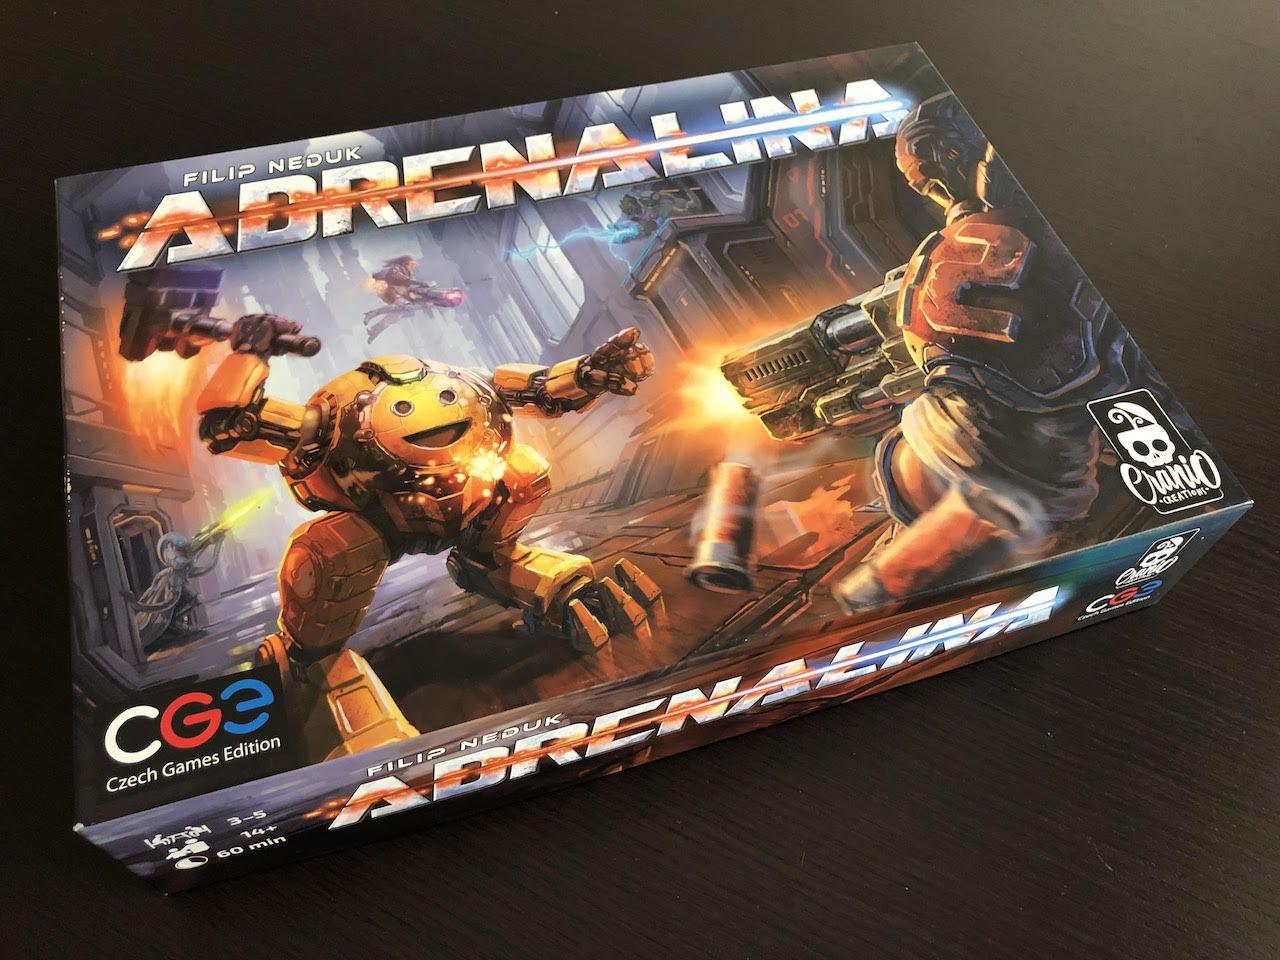 Adrenalina boom headshot la recensione del gioco da tavolo - Blood bowl gioco da tavolo recensione ...